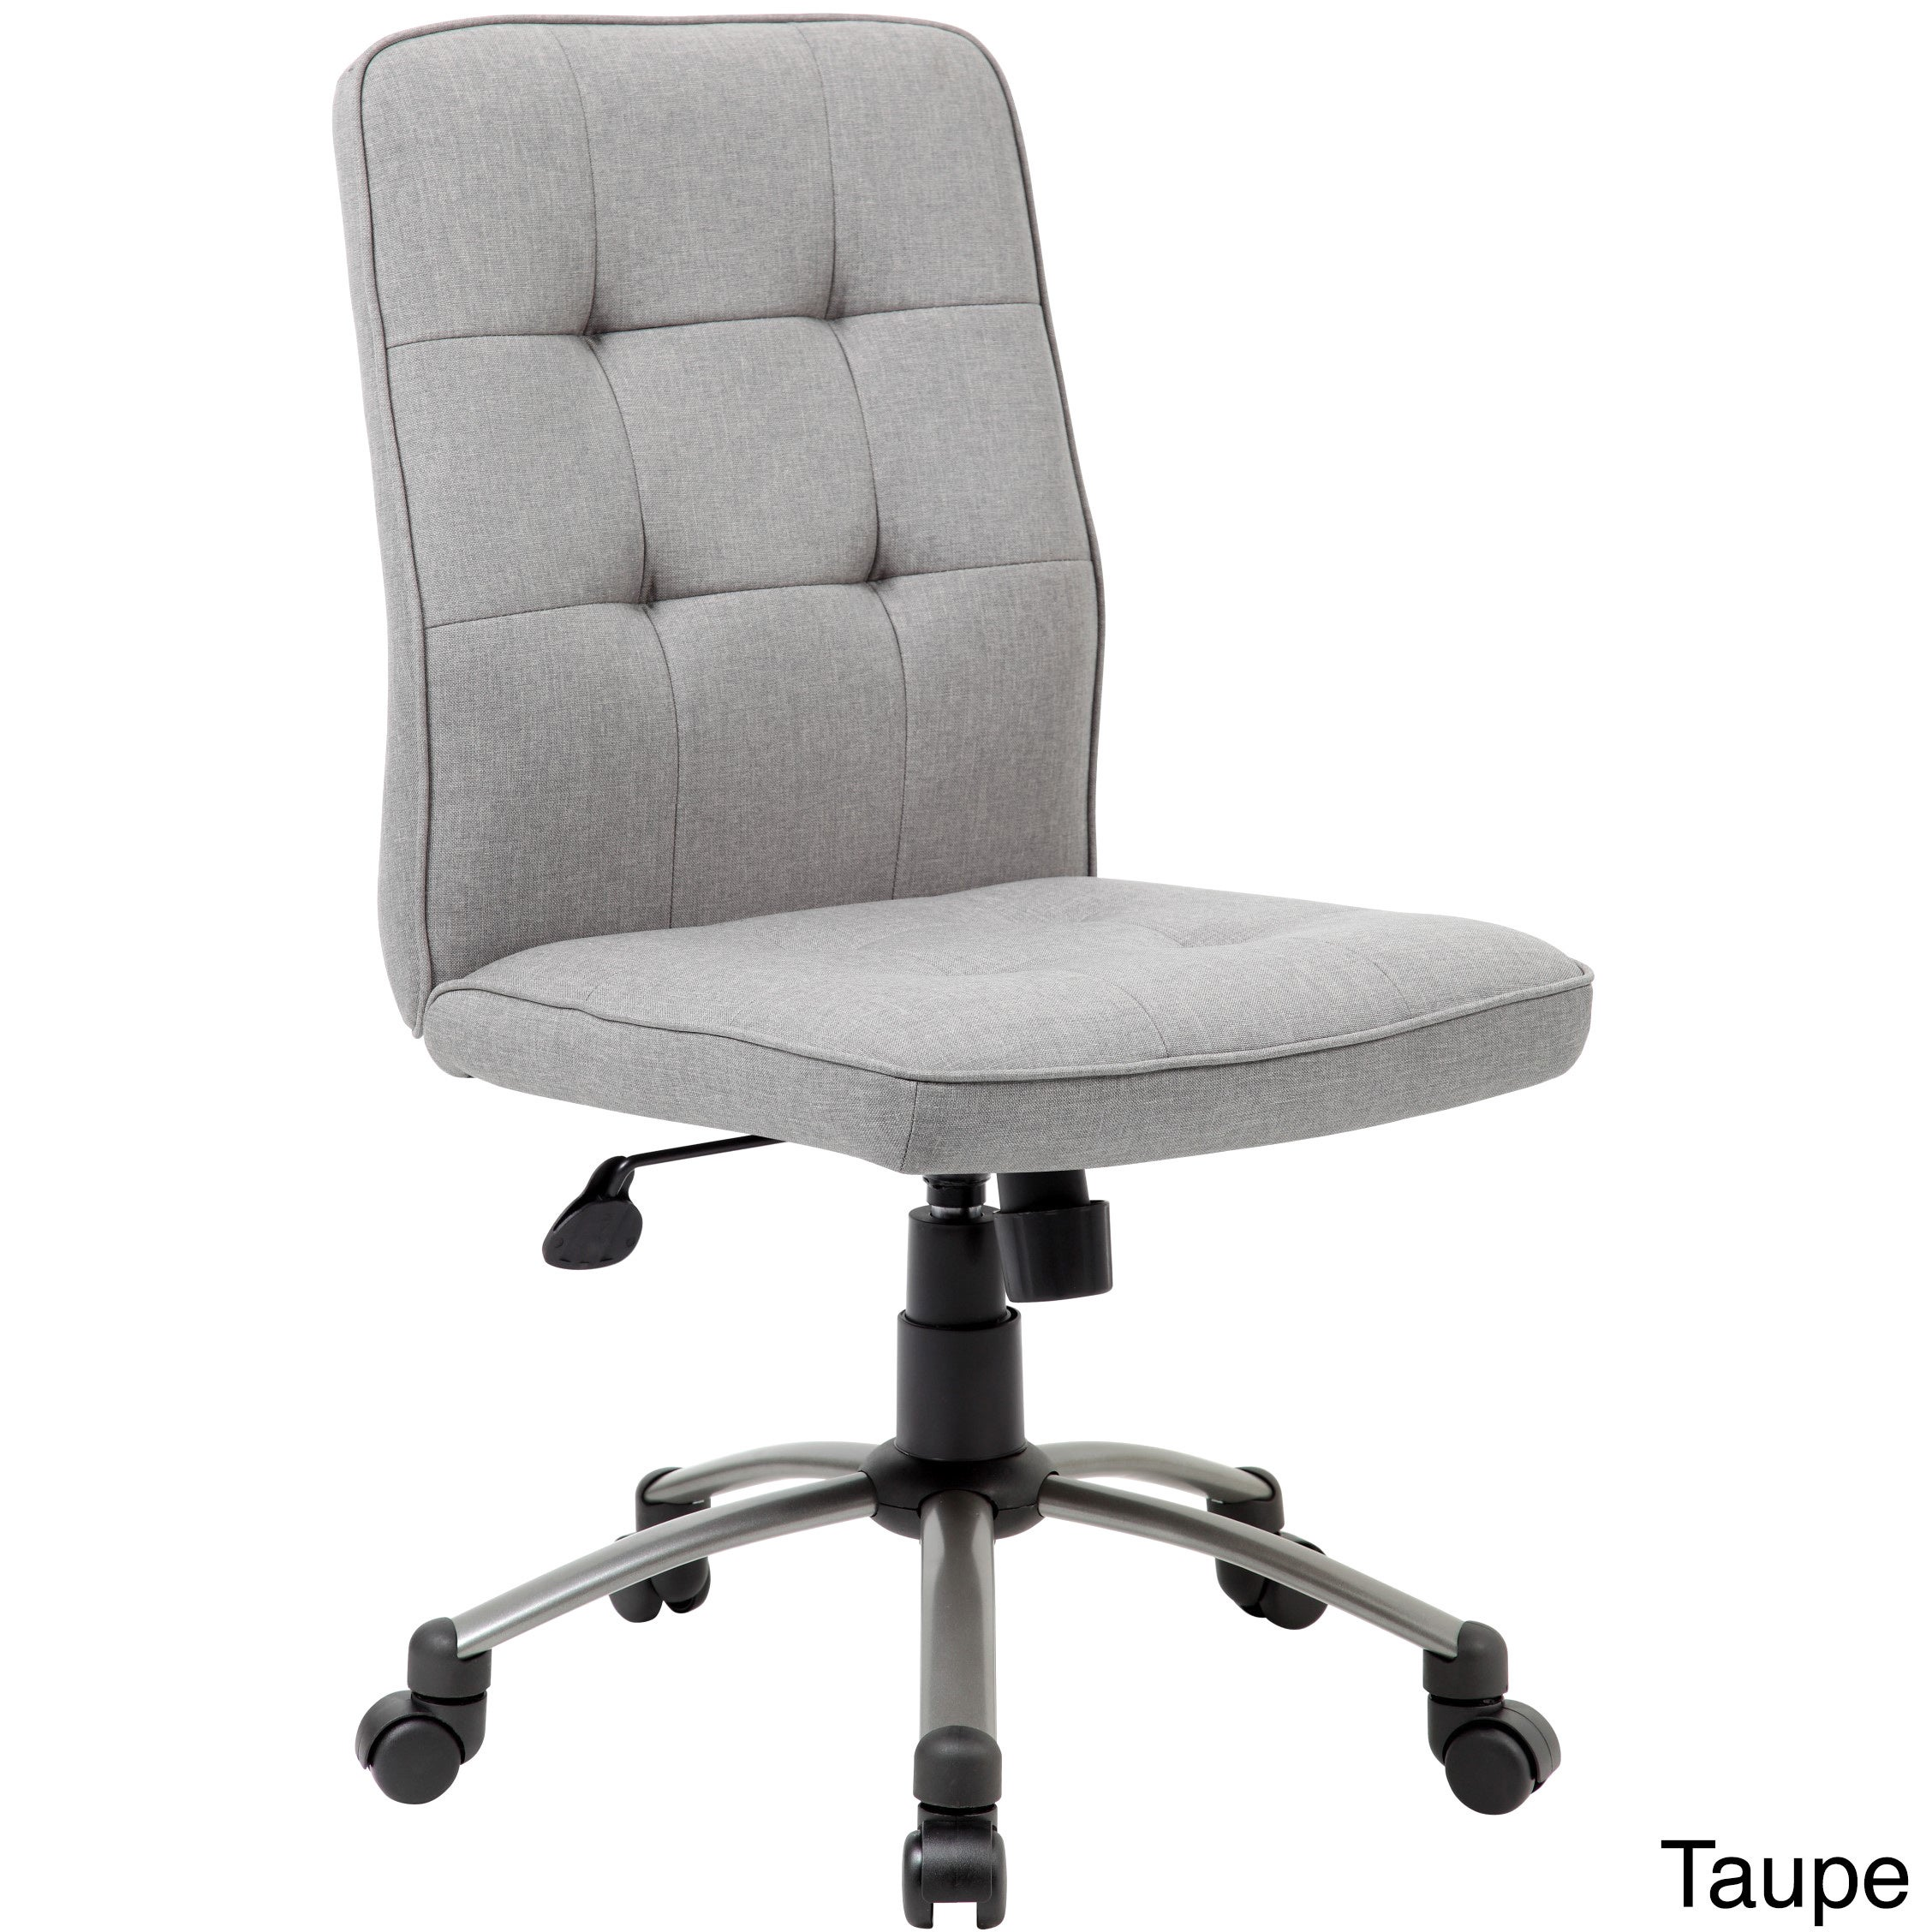 Shop Boss Fabric Modern Ergonomic Office Chair  Free Shipping Today  Overstockcom 11693392 Ergonomic Study Chair72